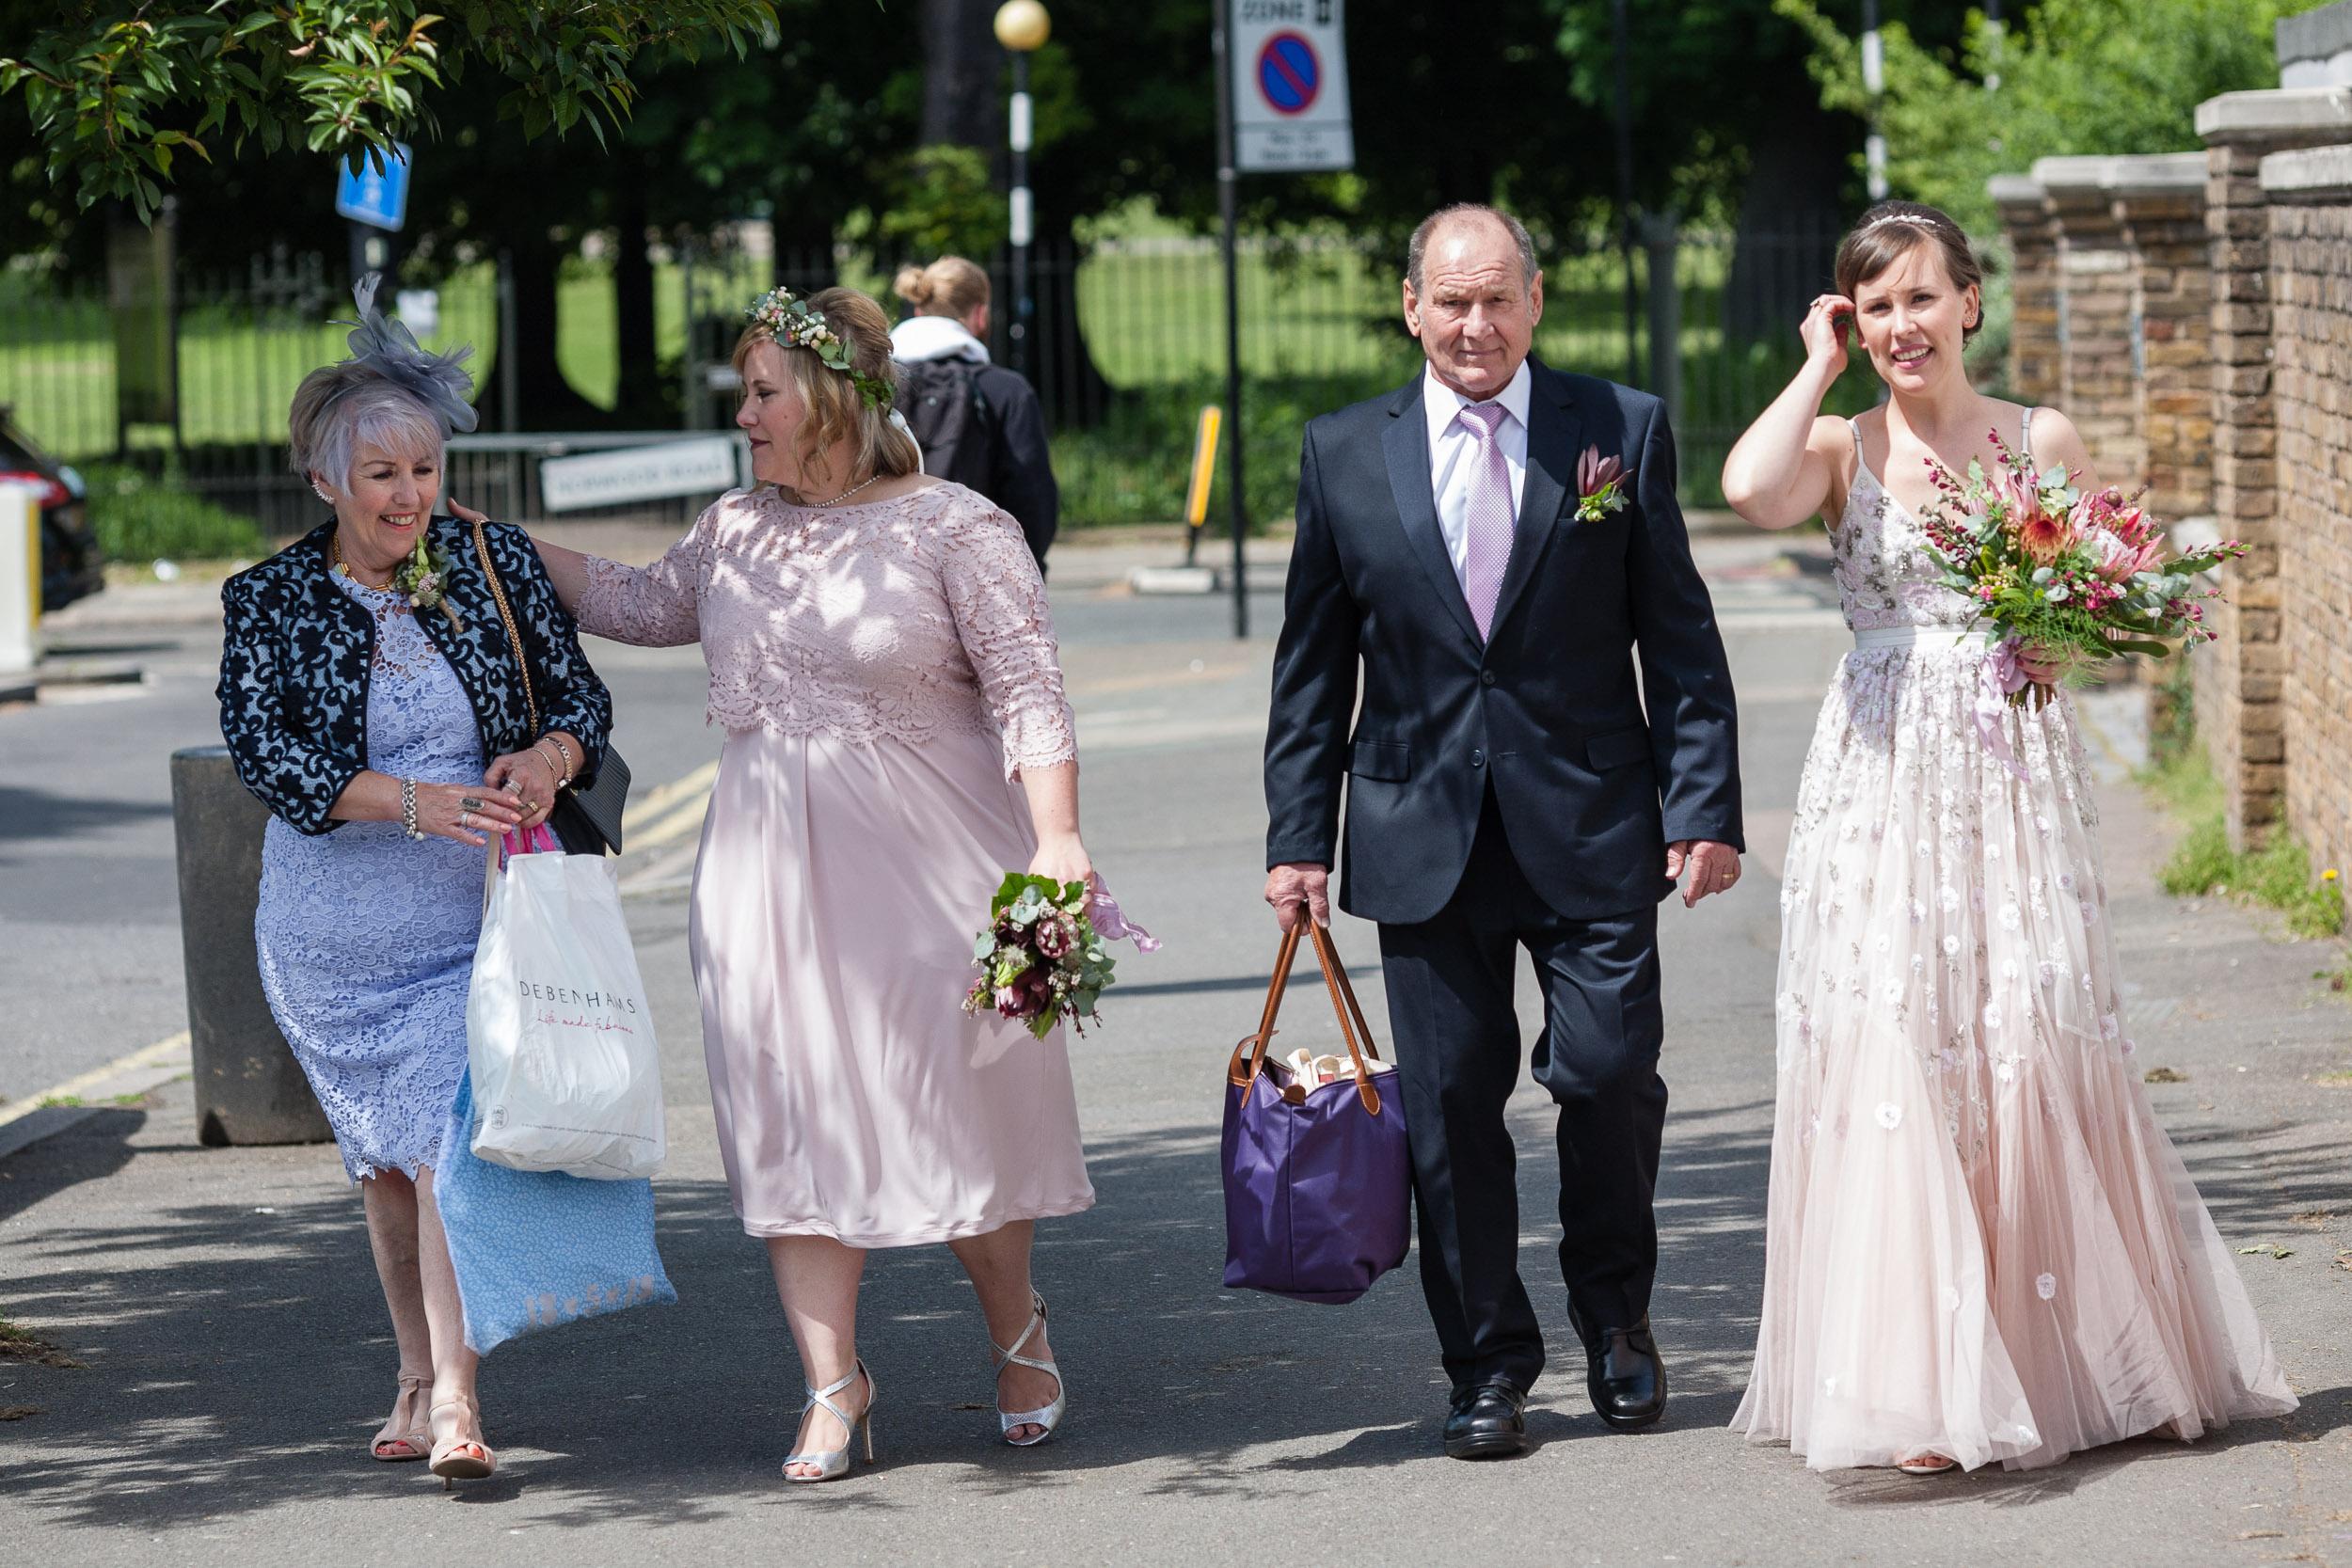 brockwell-lido-brixton-herne-hill-wedding-028.jpg